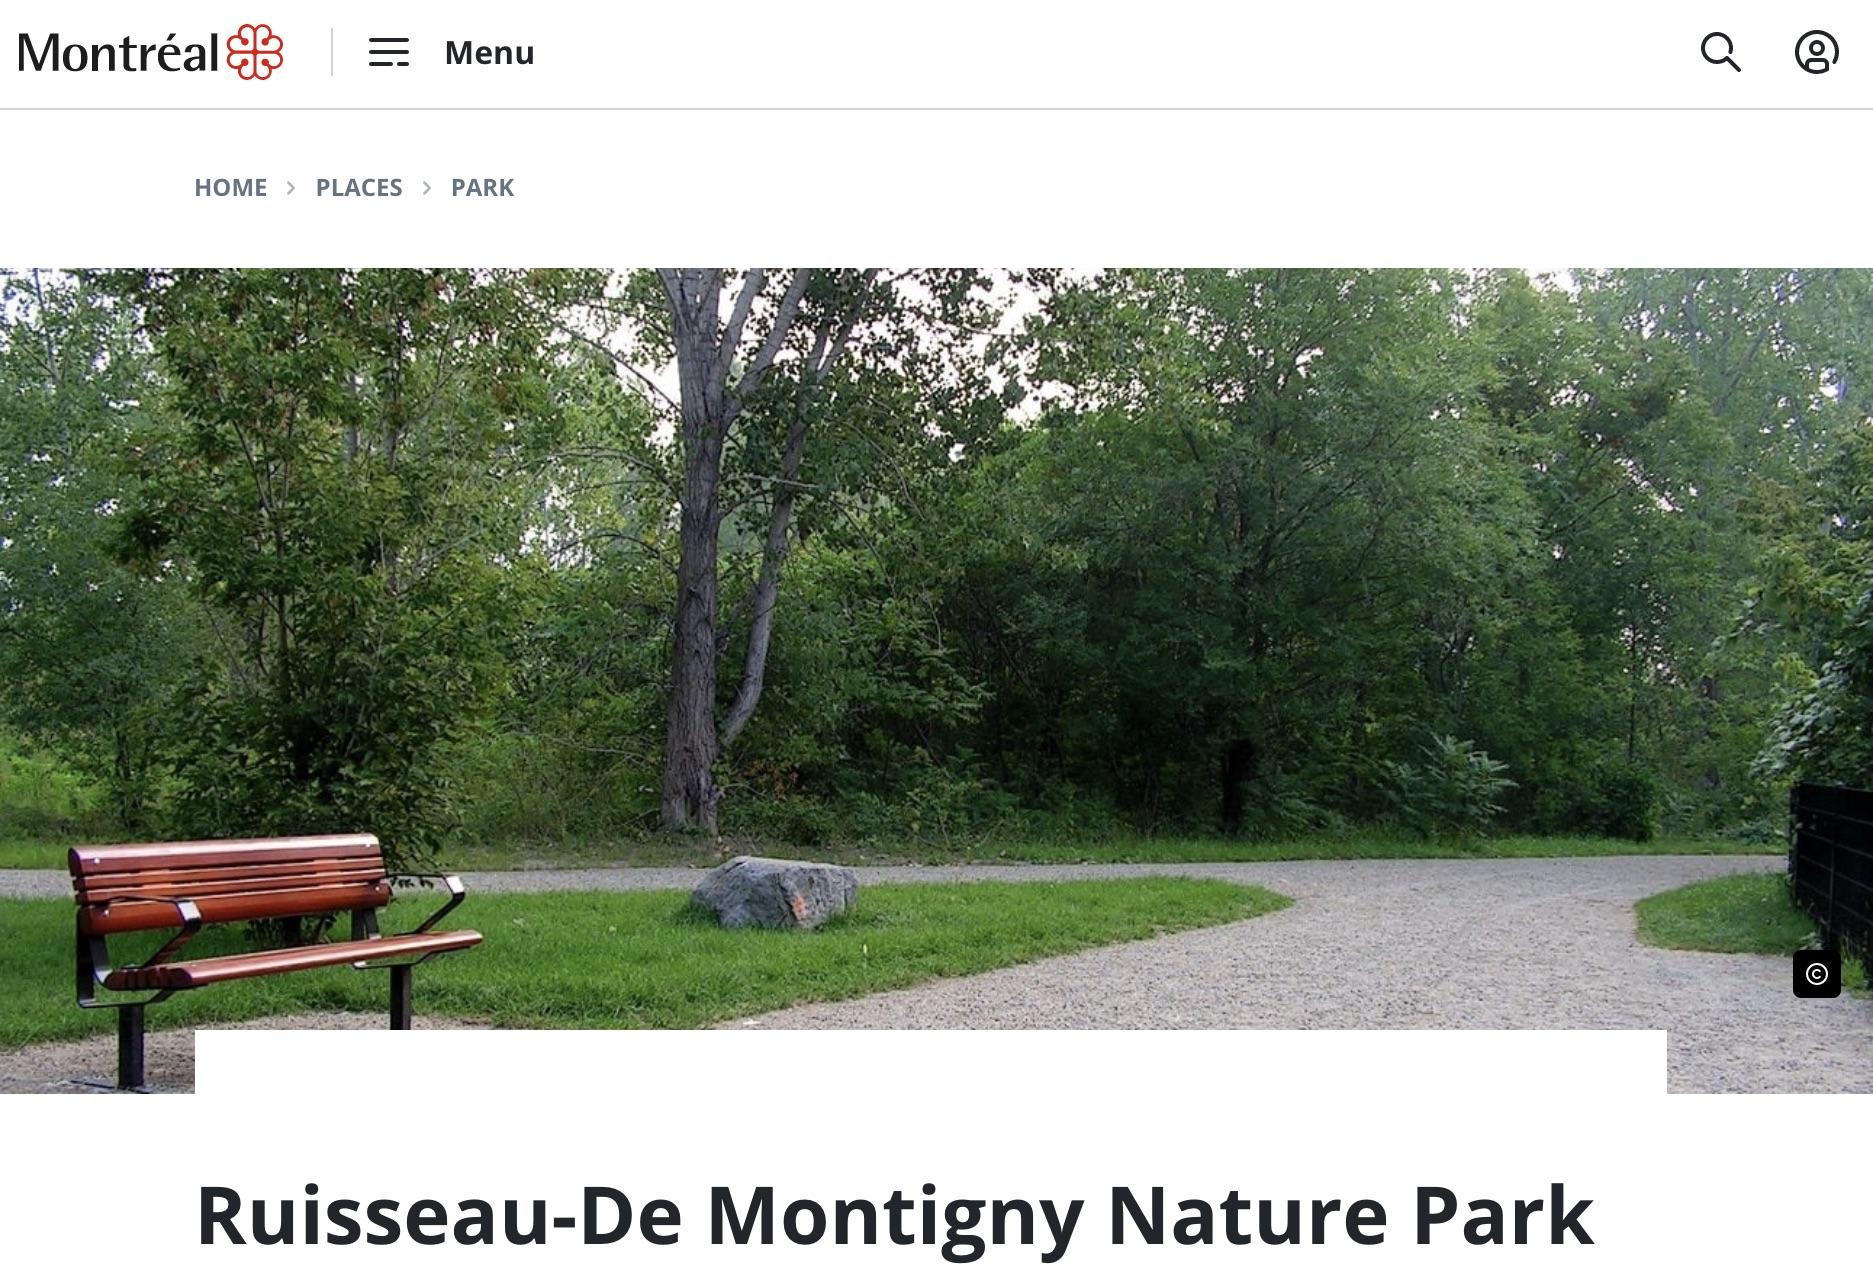 Ruisseau-De Montigny Nature Park